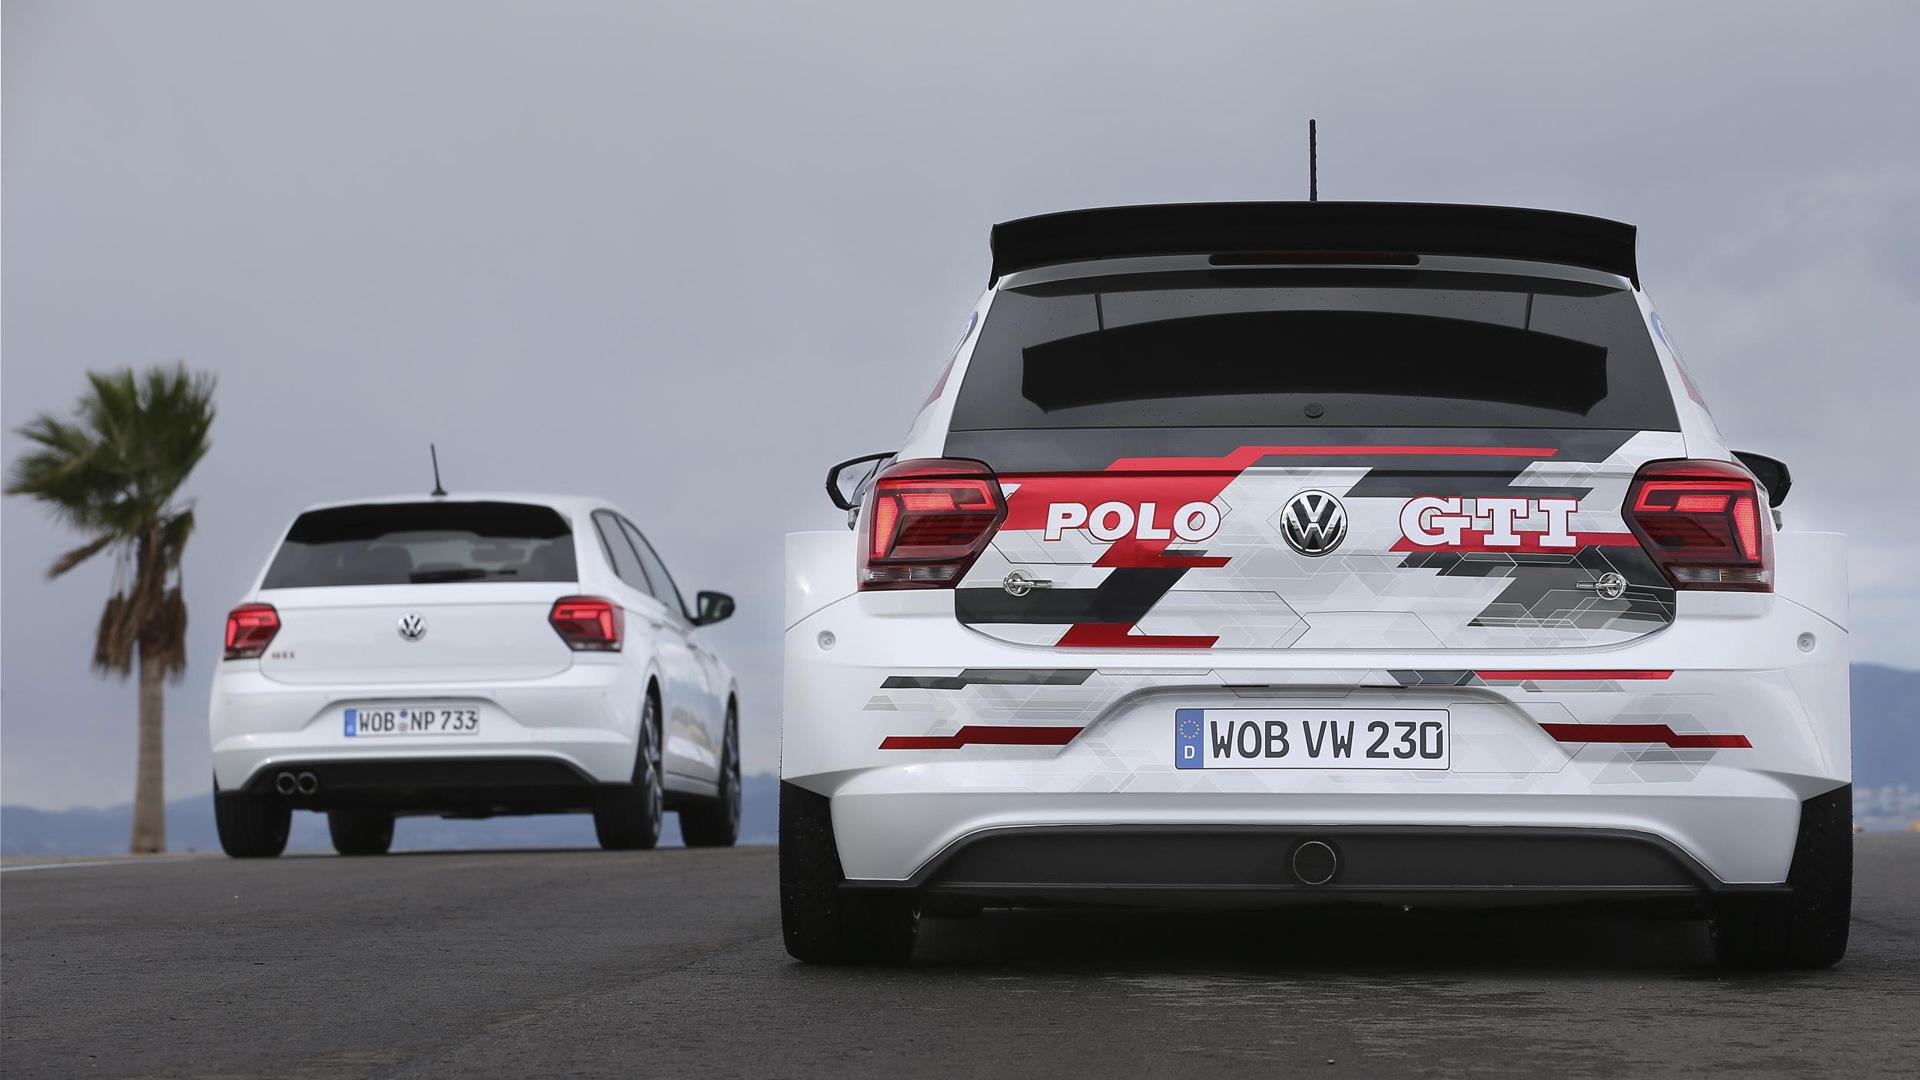 2018 Volkswagen Polo GTI R5 rally car